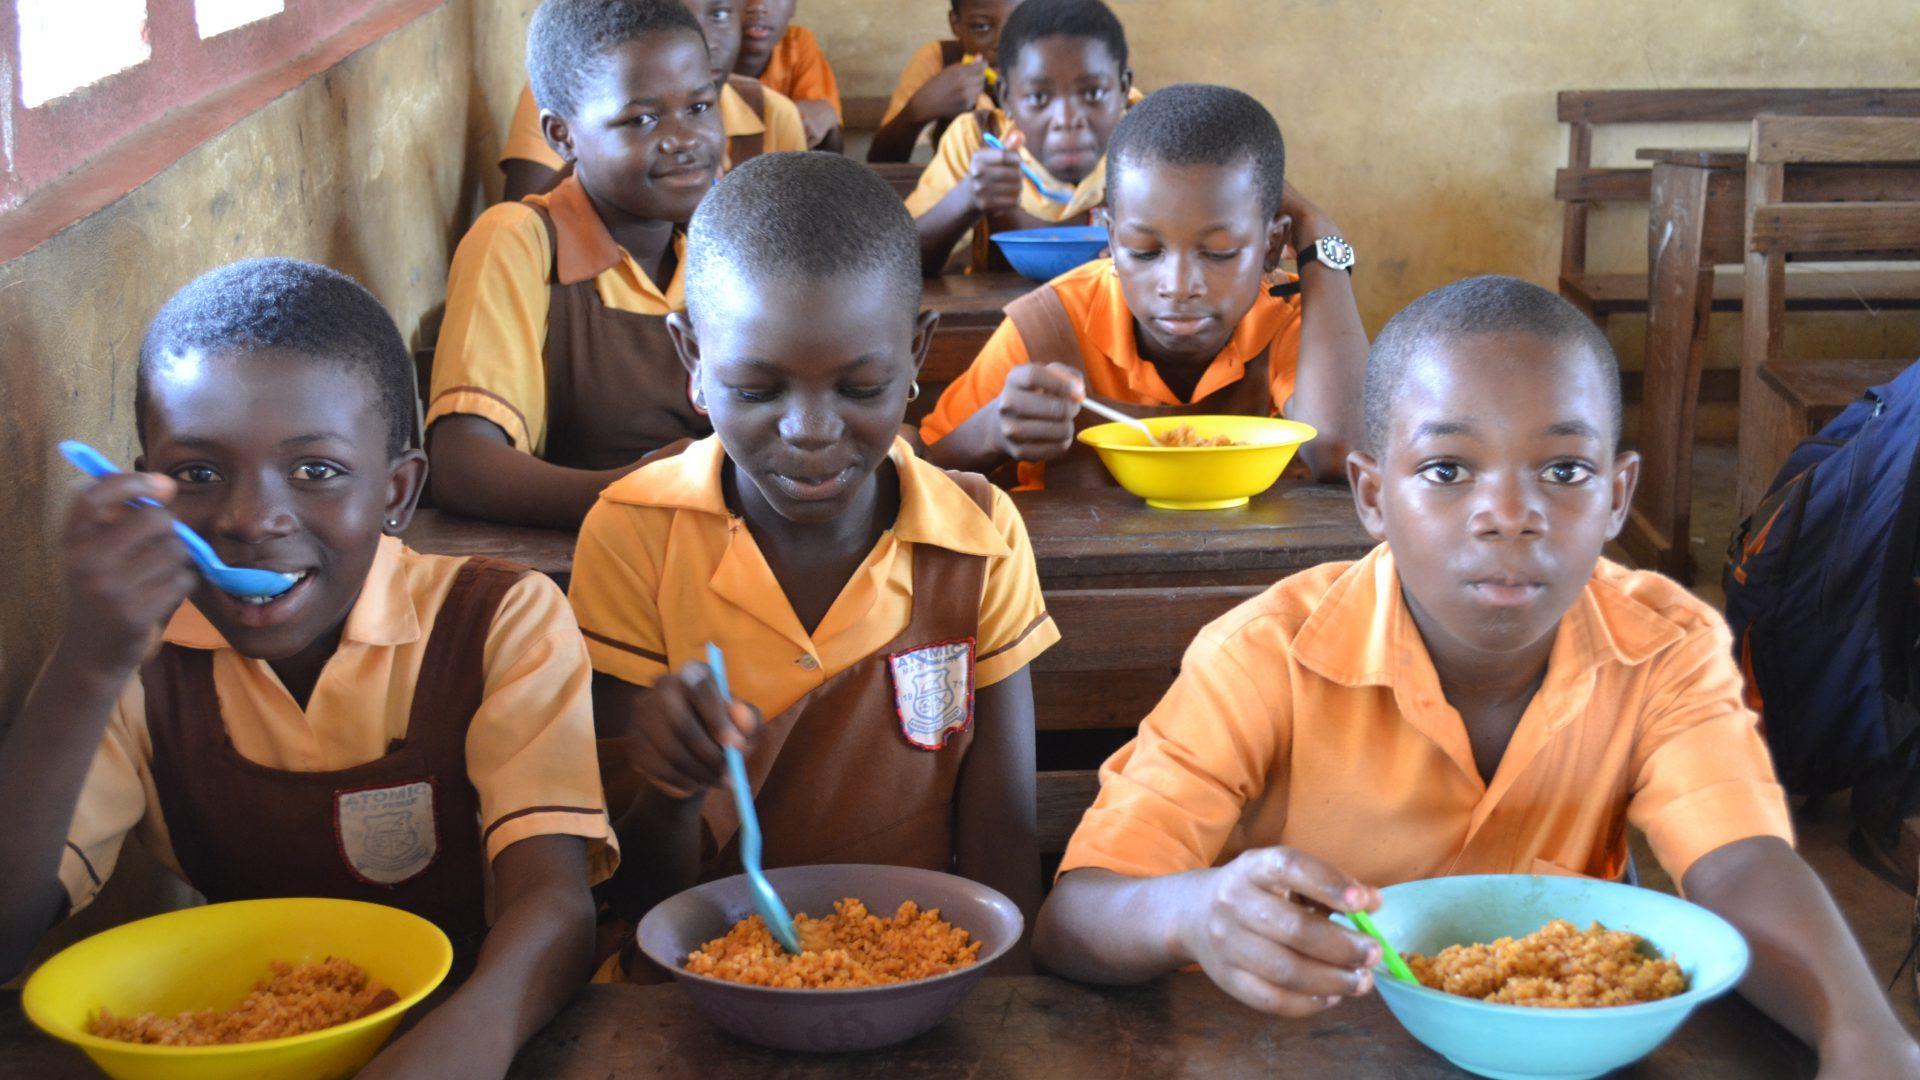 School Feeding Programme: Each meal per child costs N70 — Govt